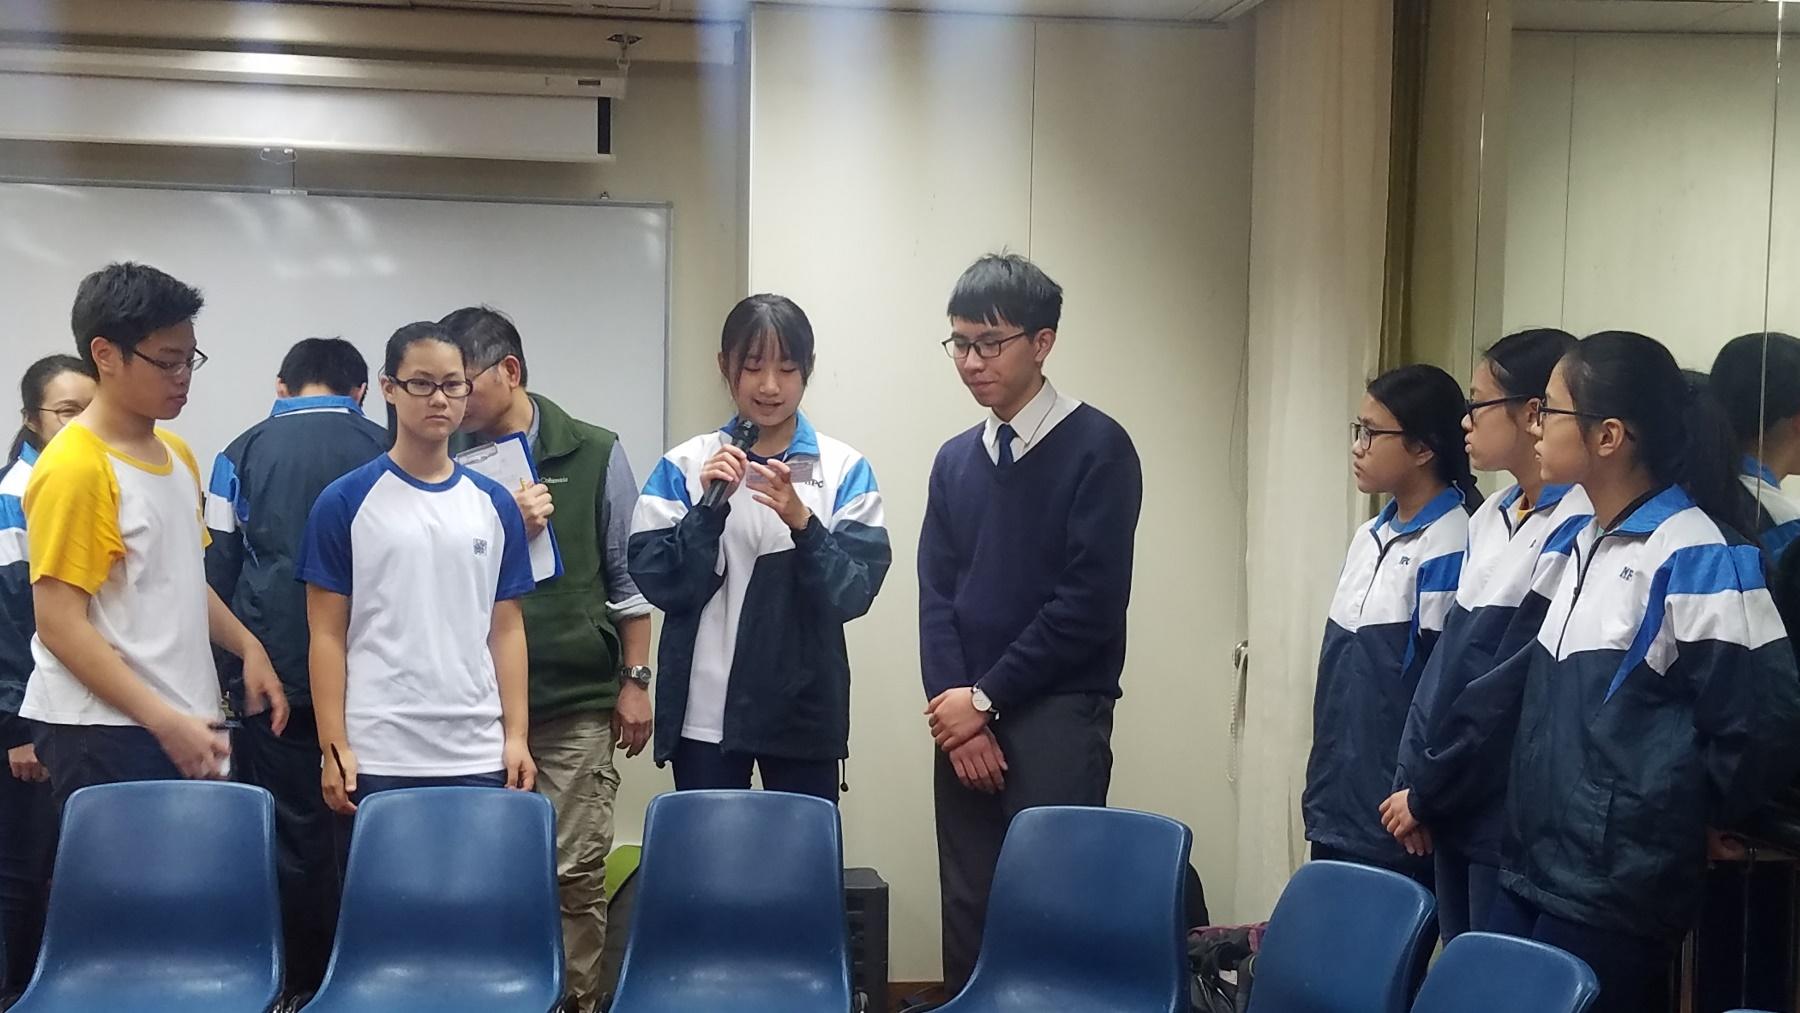 http://npc.edu.hk/sites/default/files/20180126_142125.jpg